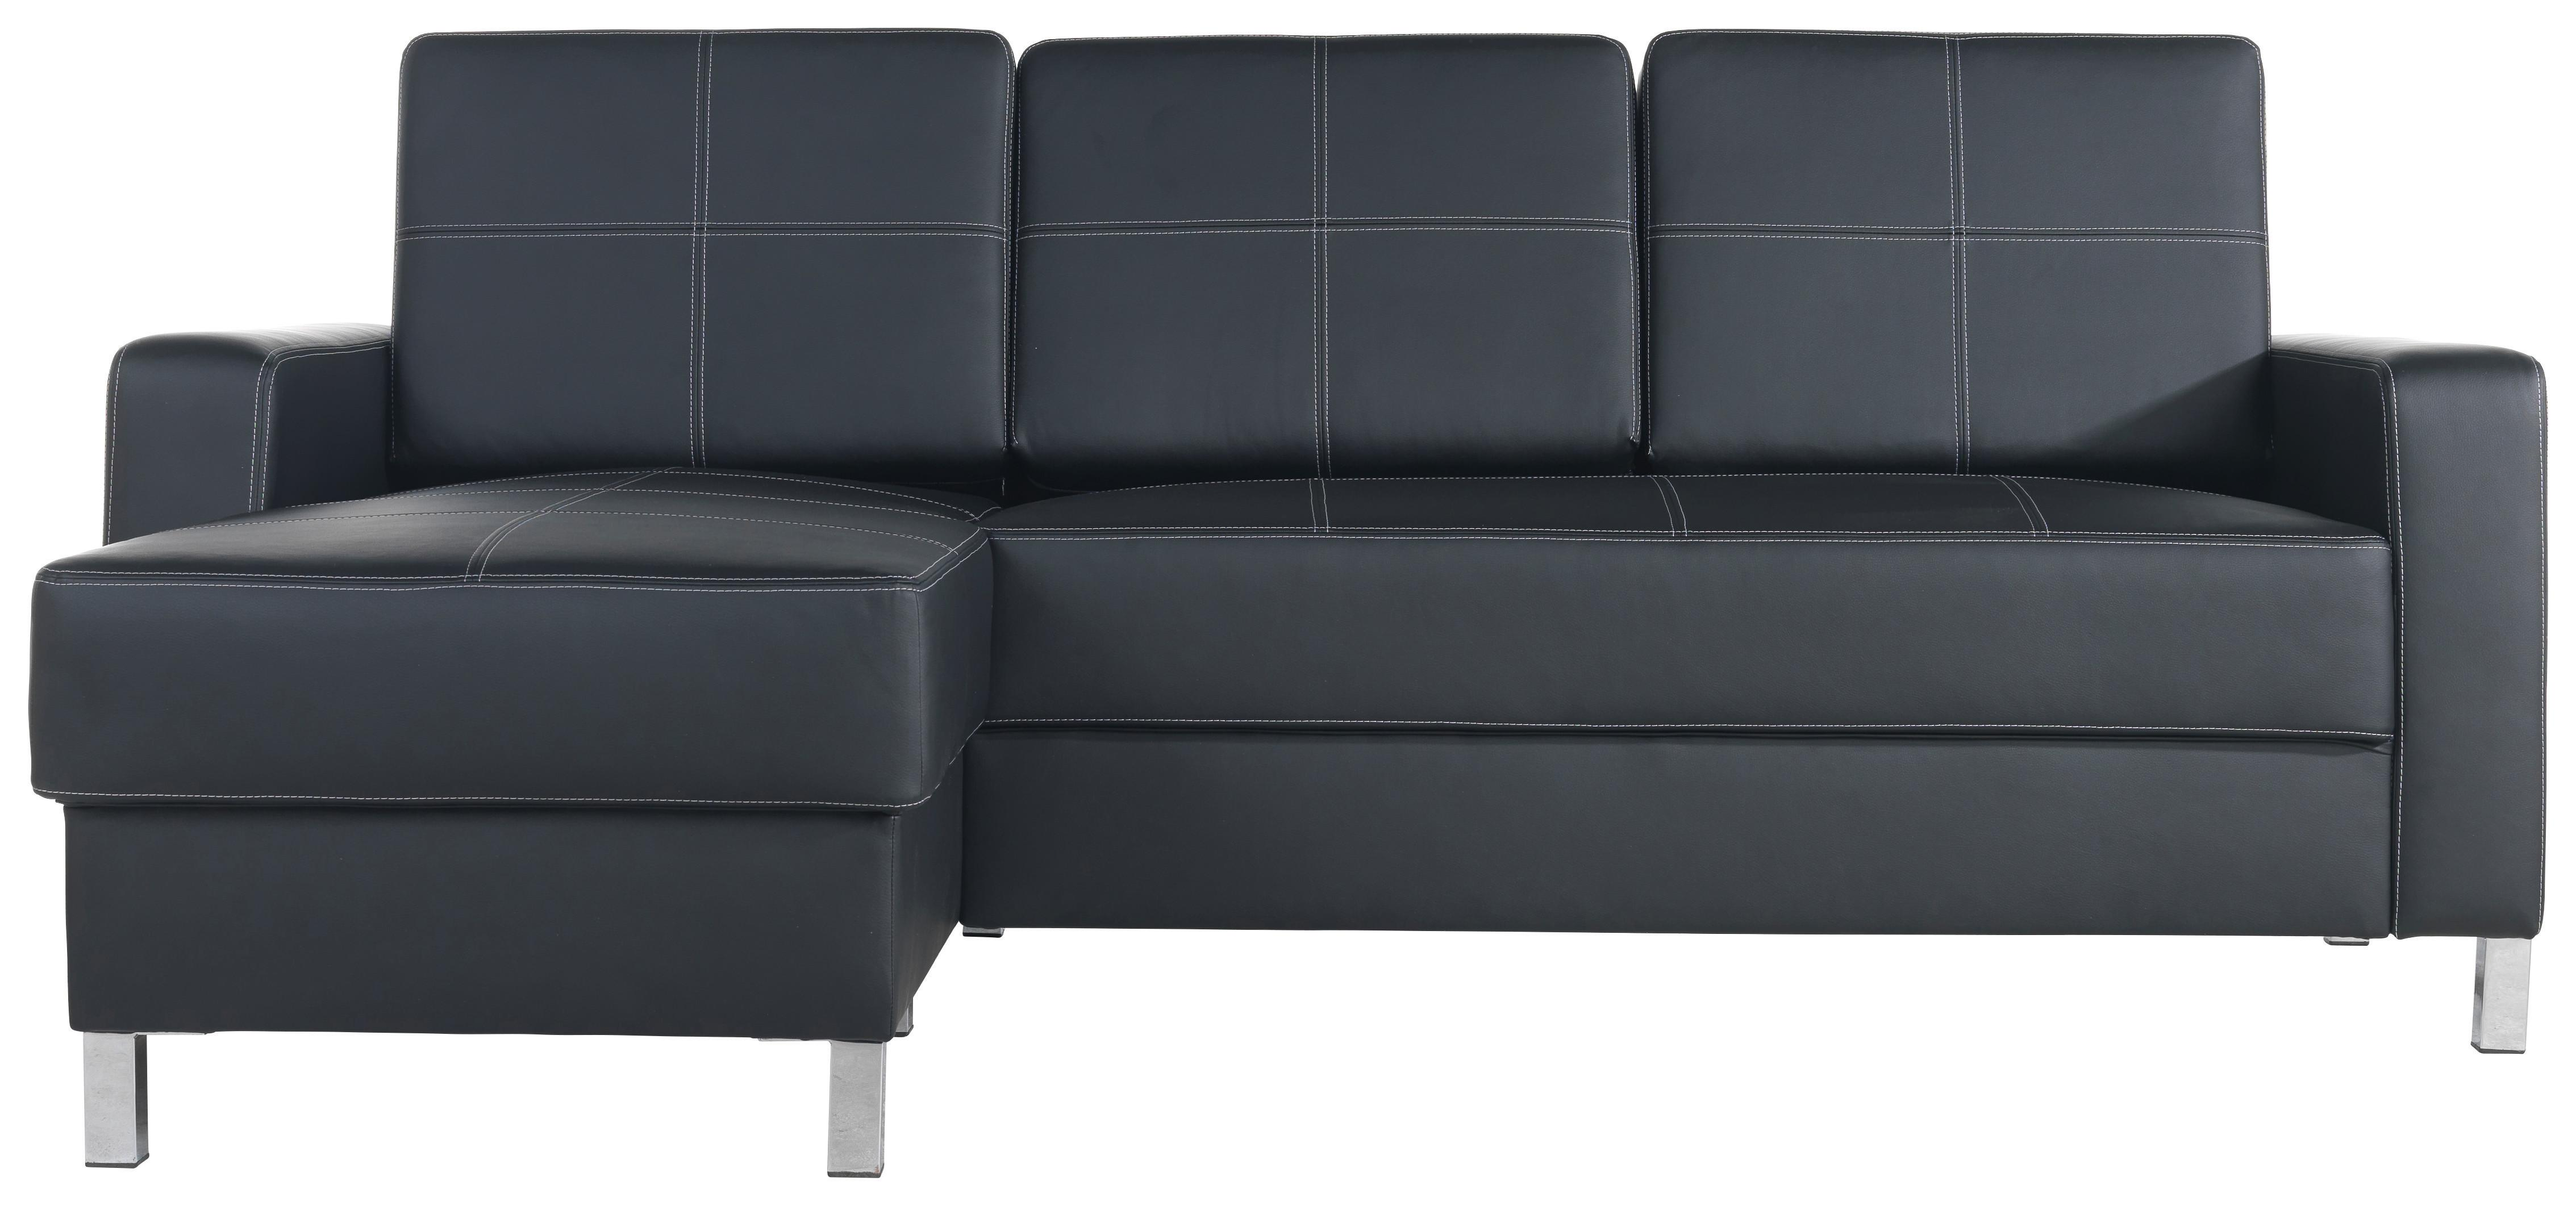 SAROKGARNITÚRA COLORADO - fekete, Lifestyle, textil/fém (203/144cm)